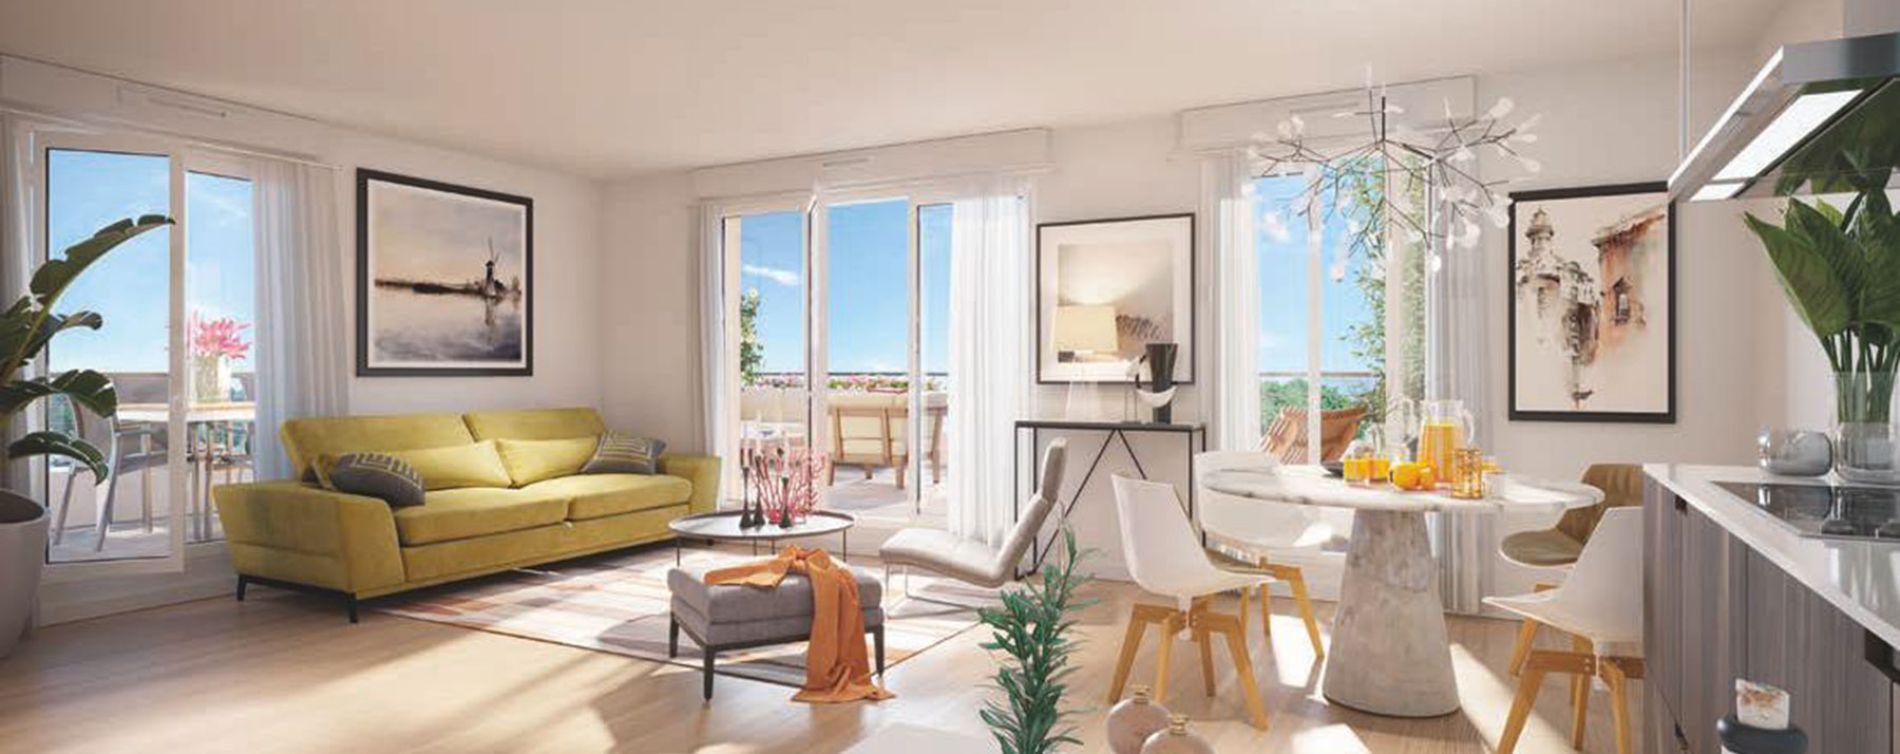 Mennecy : programme immobilier neuve « Programme immobilier n°217813 » en Loi Pinel (4)